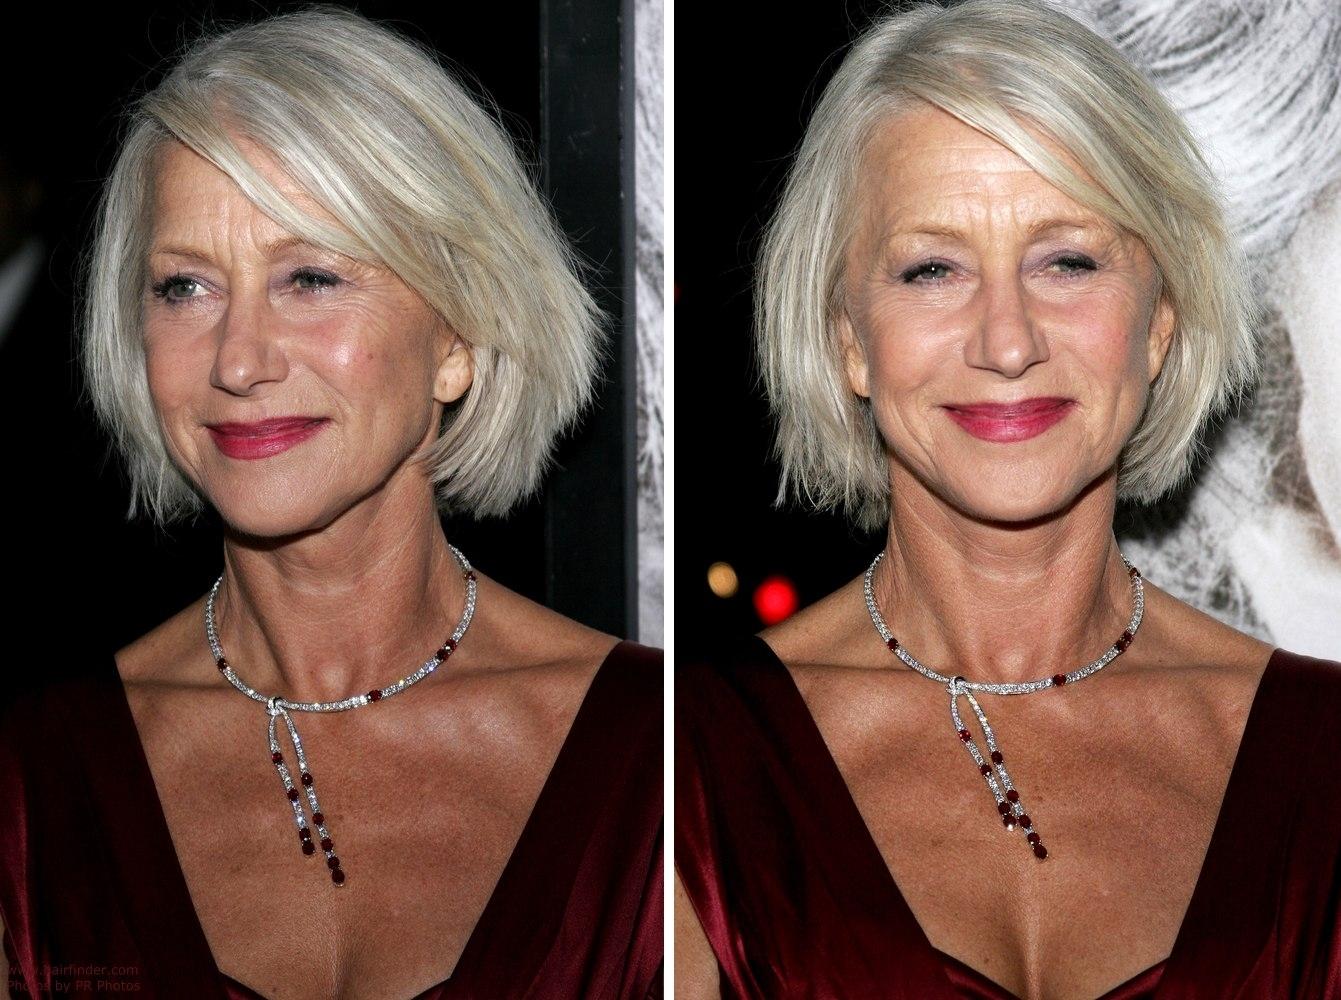 Helen Mirren With Her Silver Hair Cut To A Chin Length Bob within Helen Mirren Haior Cut